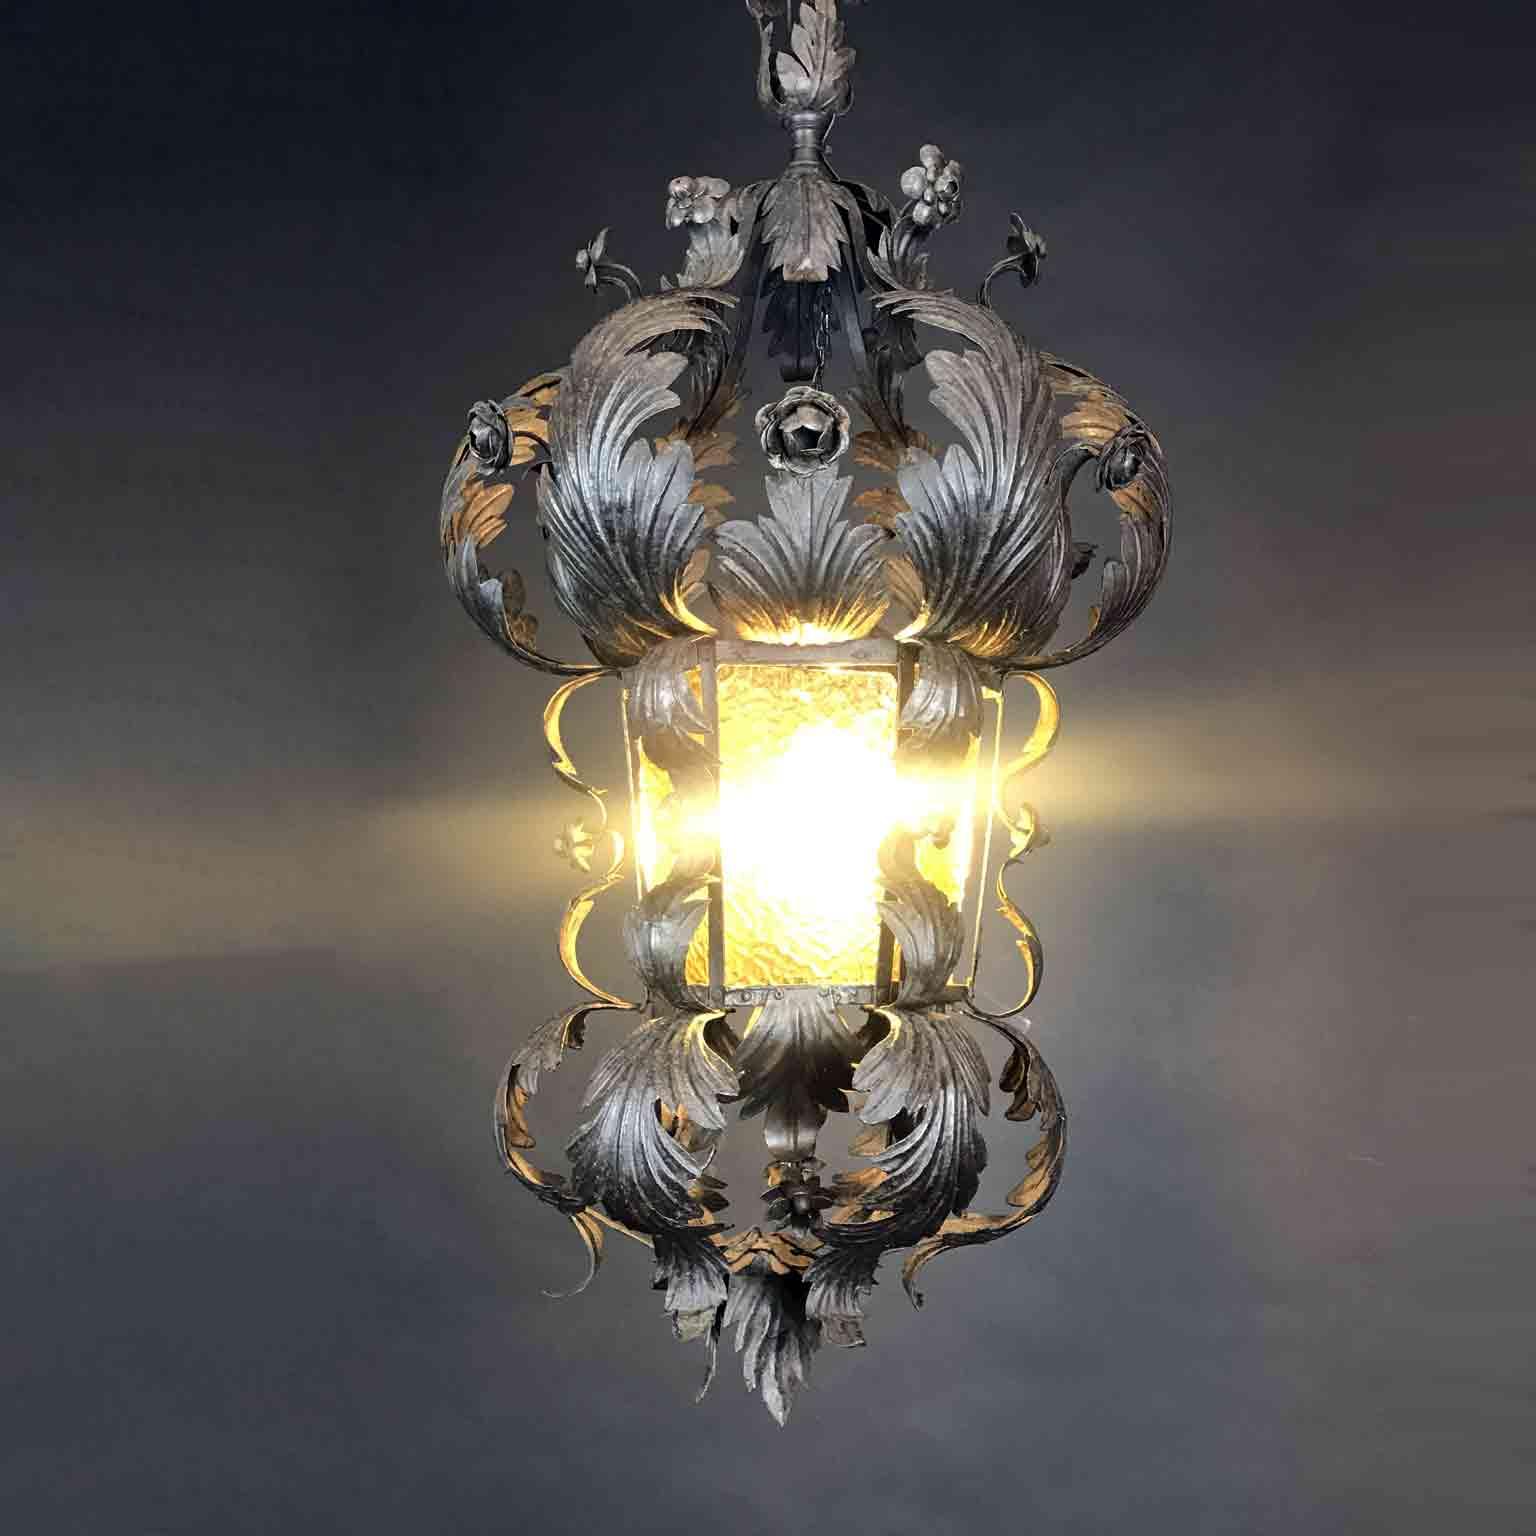 lanterna in ferro sbalzato